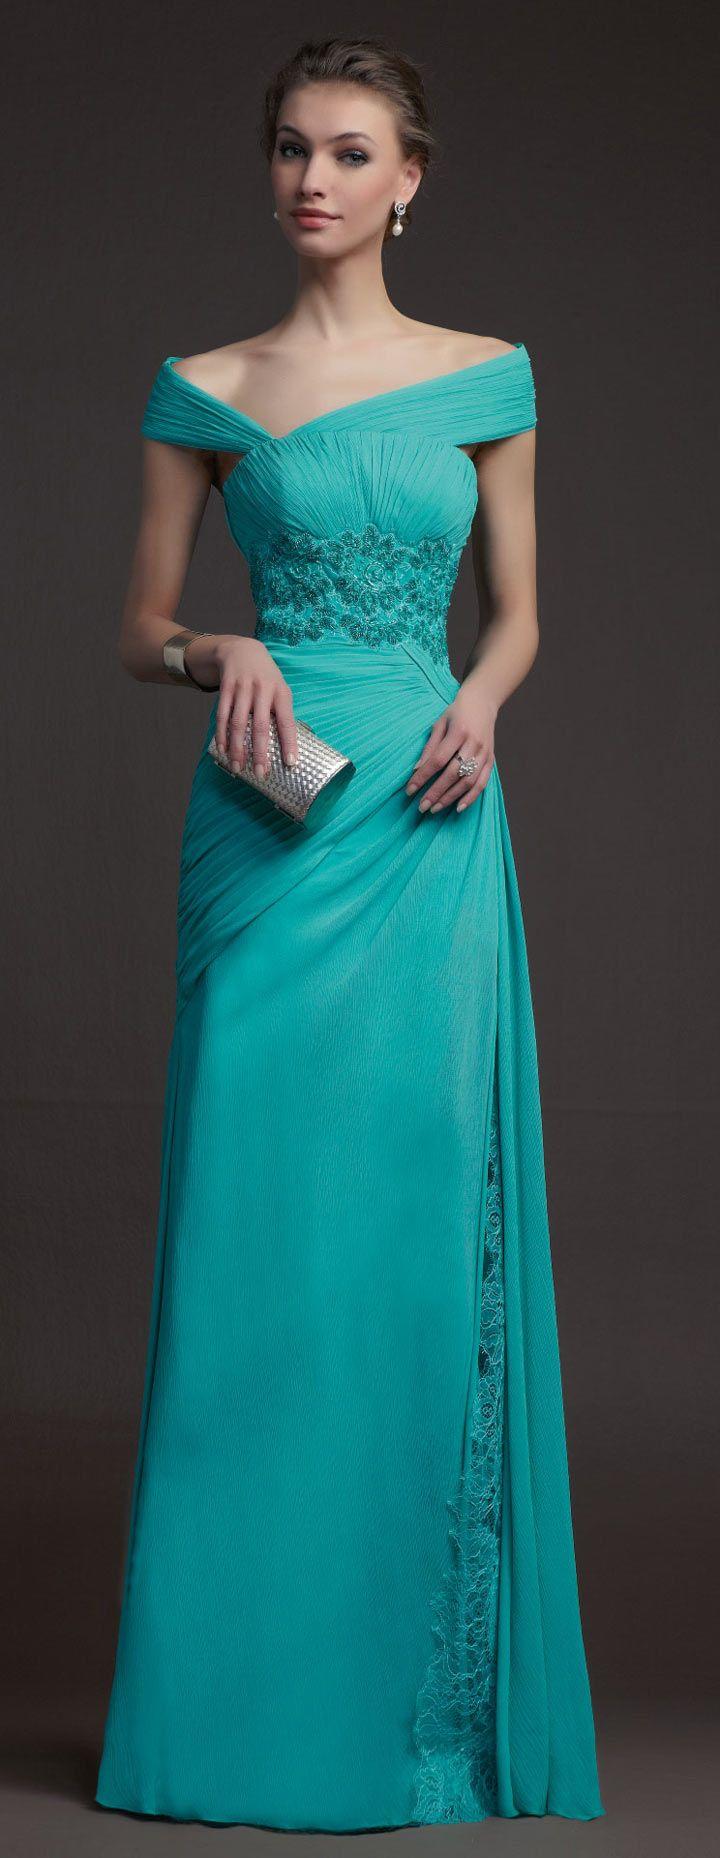 126 best Mother of The Bride/Groom images on Pinterest | Wedding ...